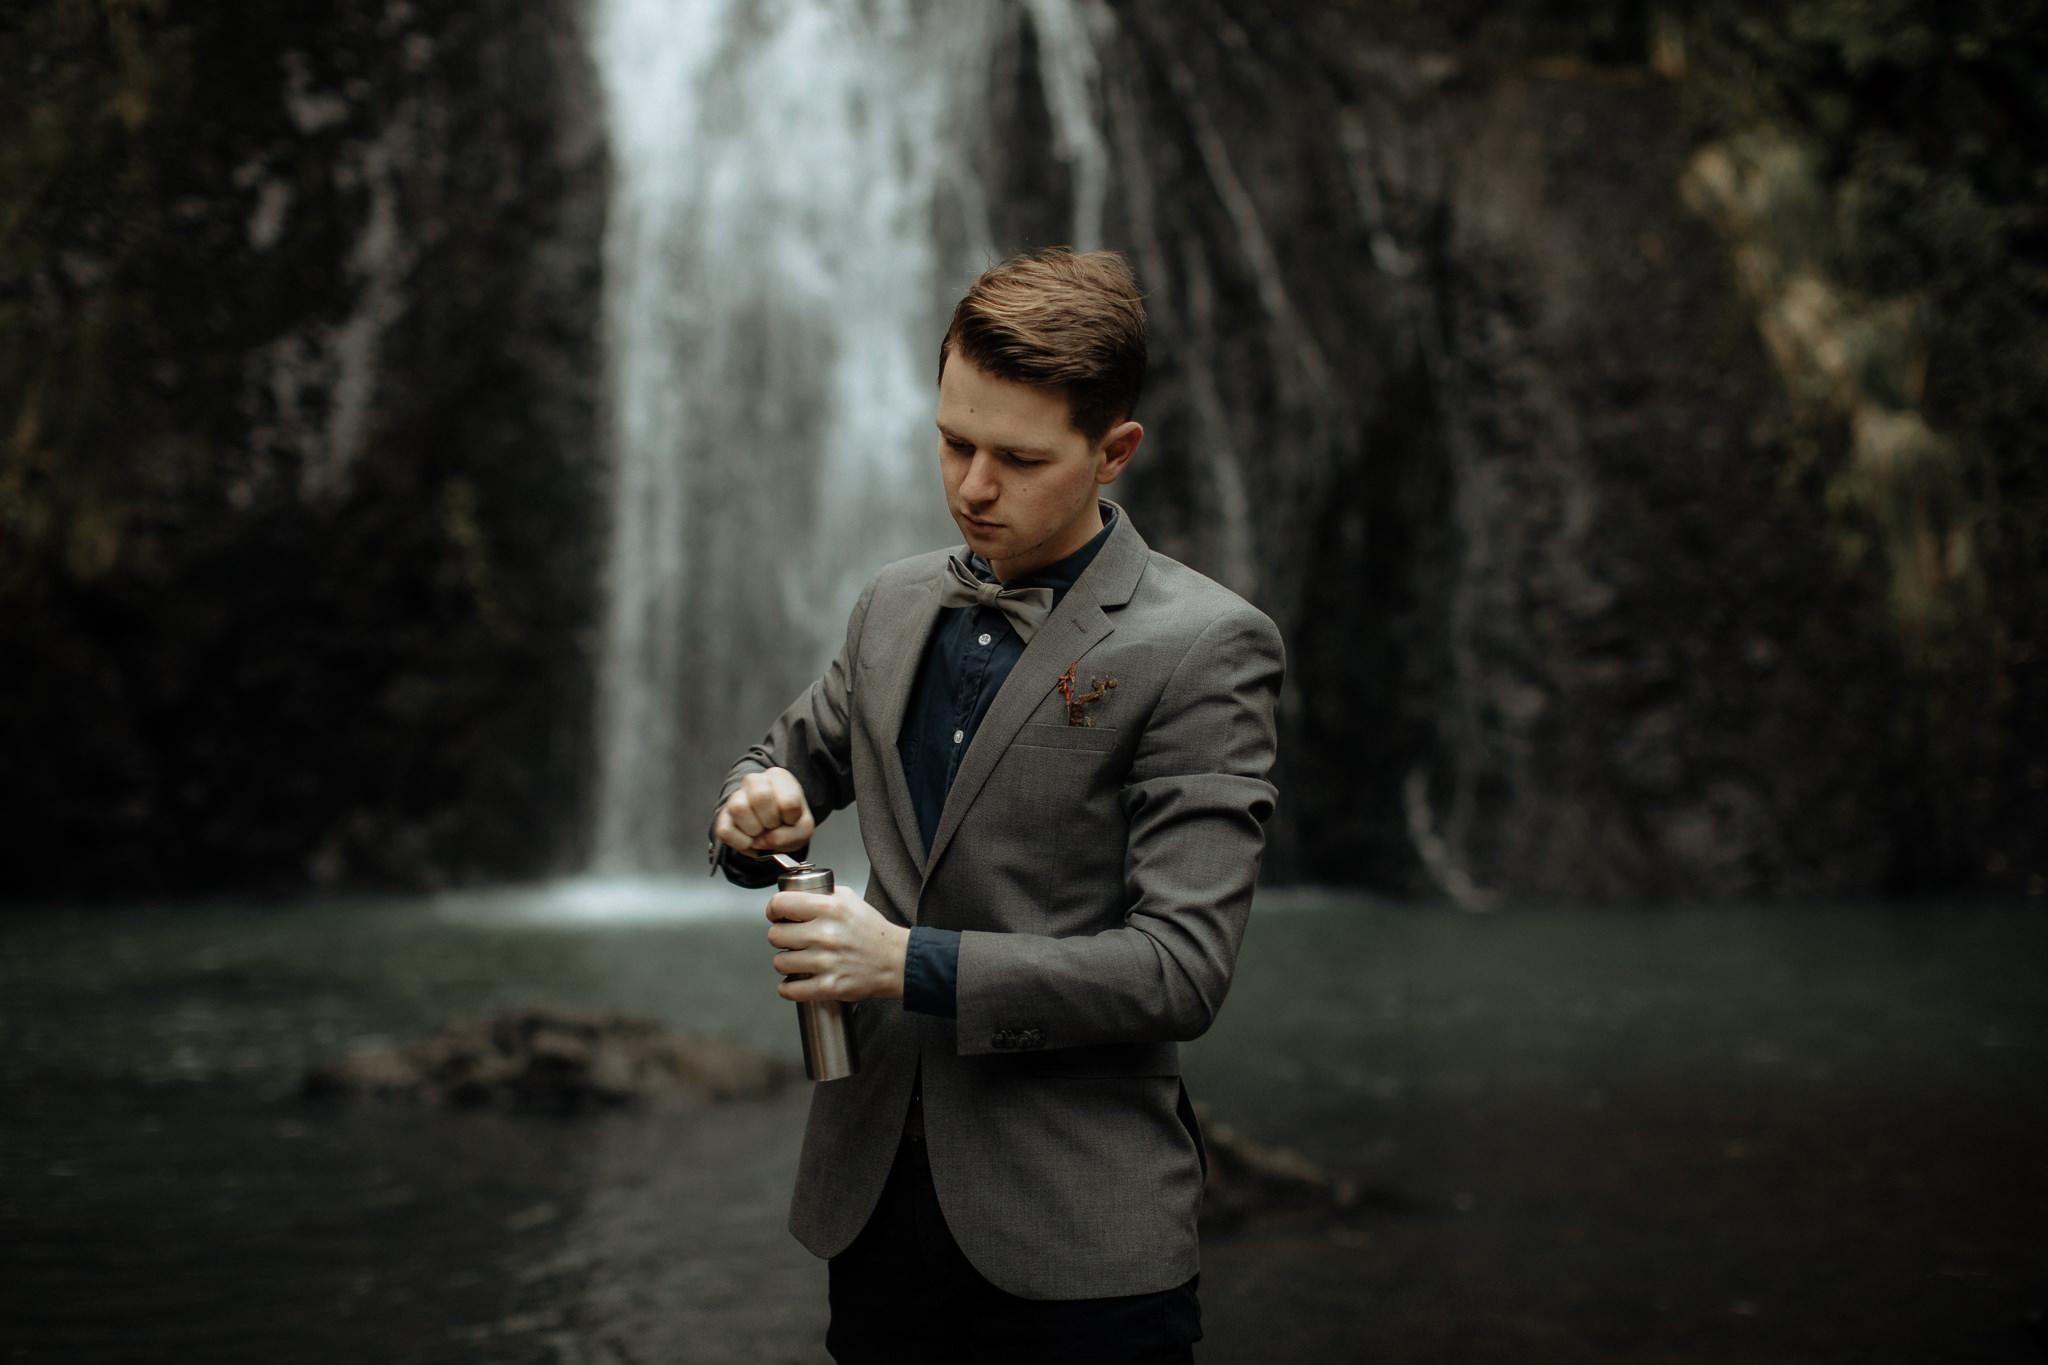 auckland-wedding-photographer-24476.jpg